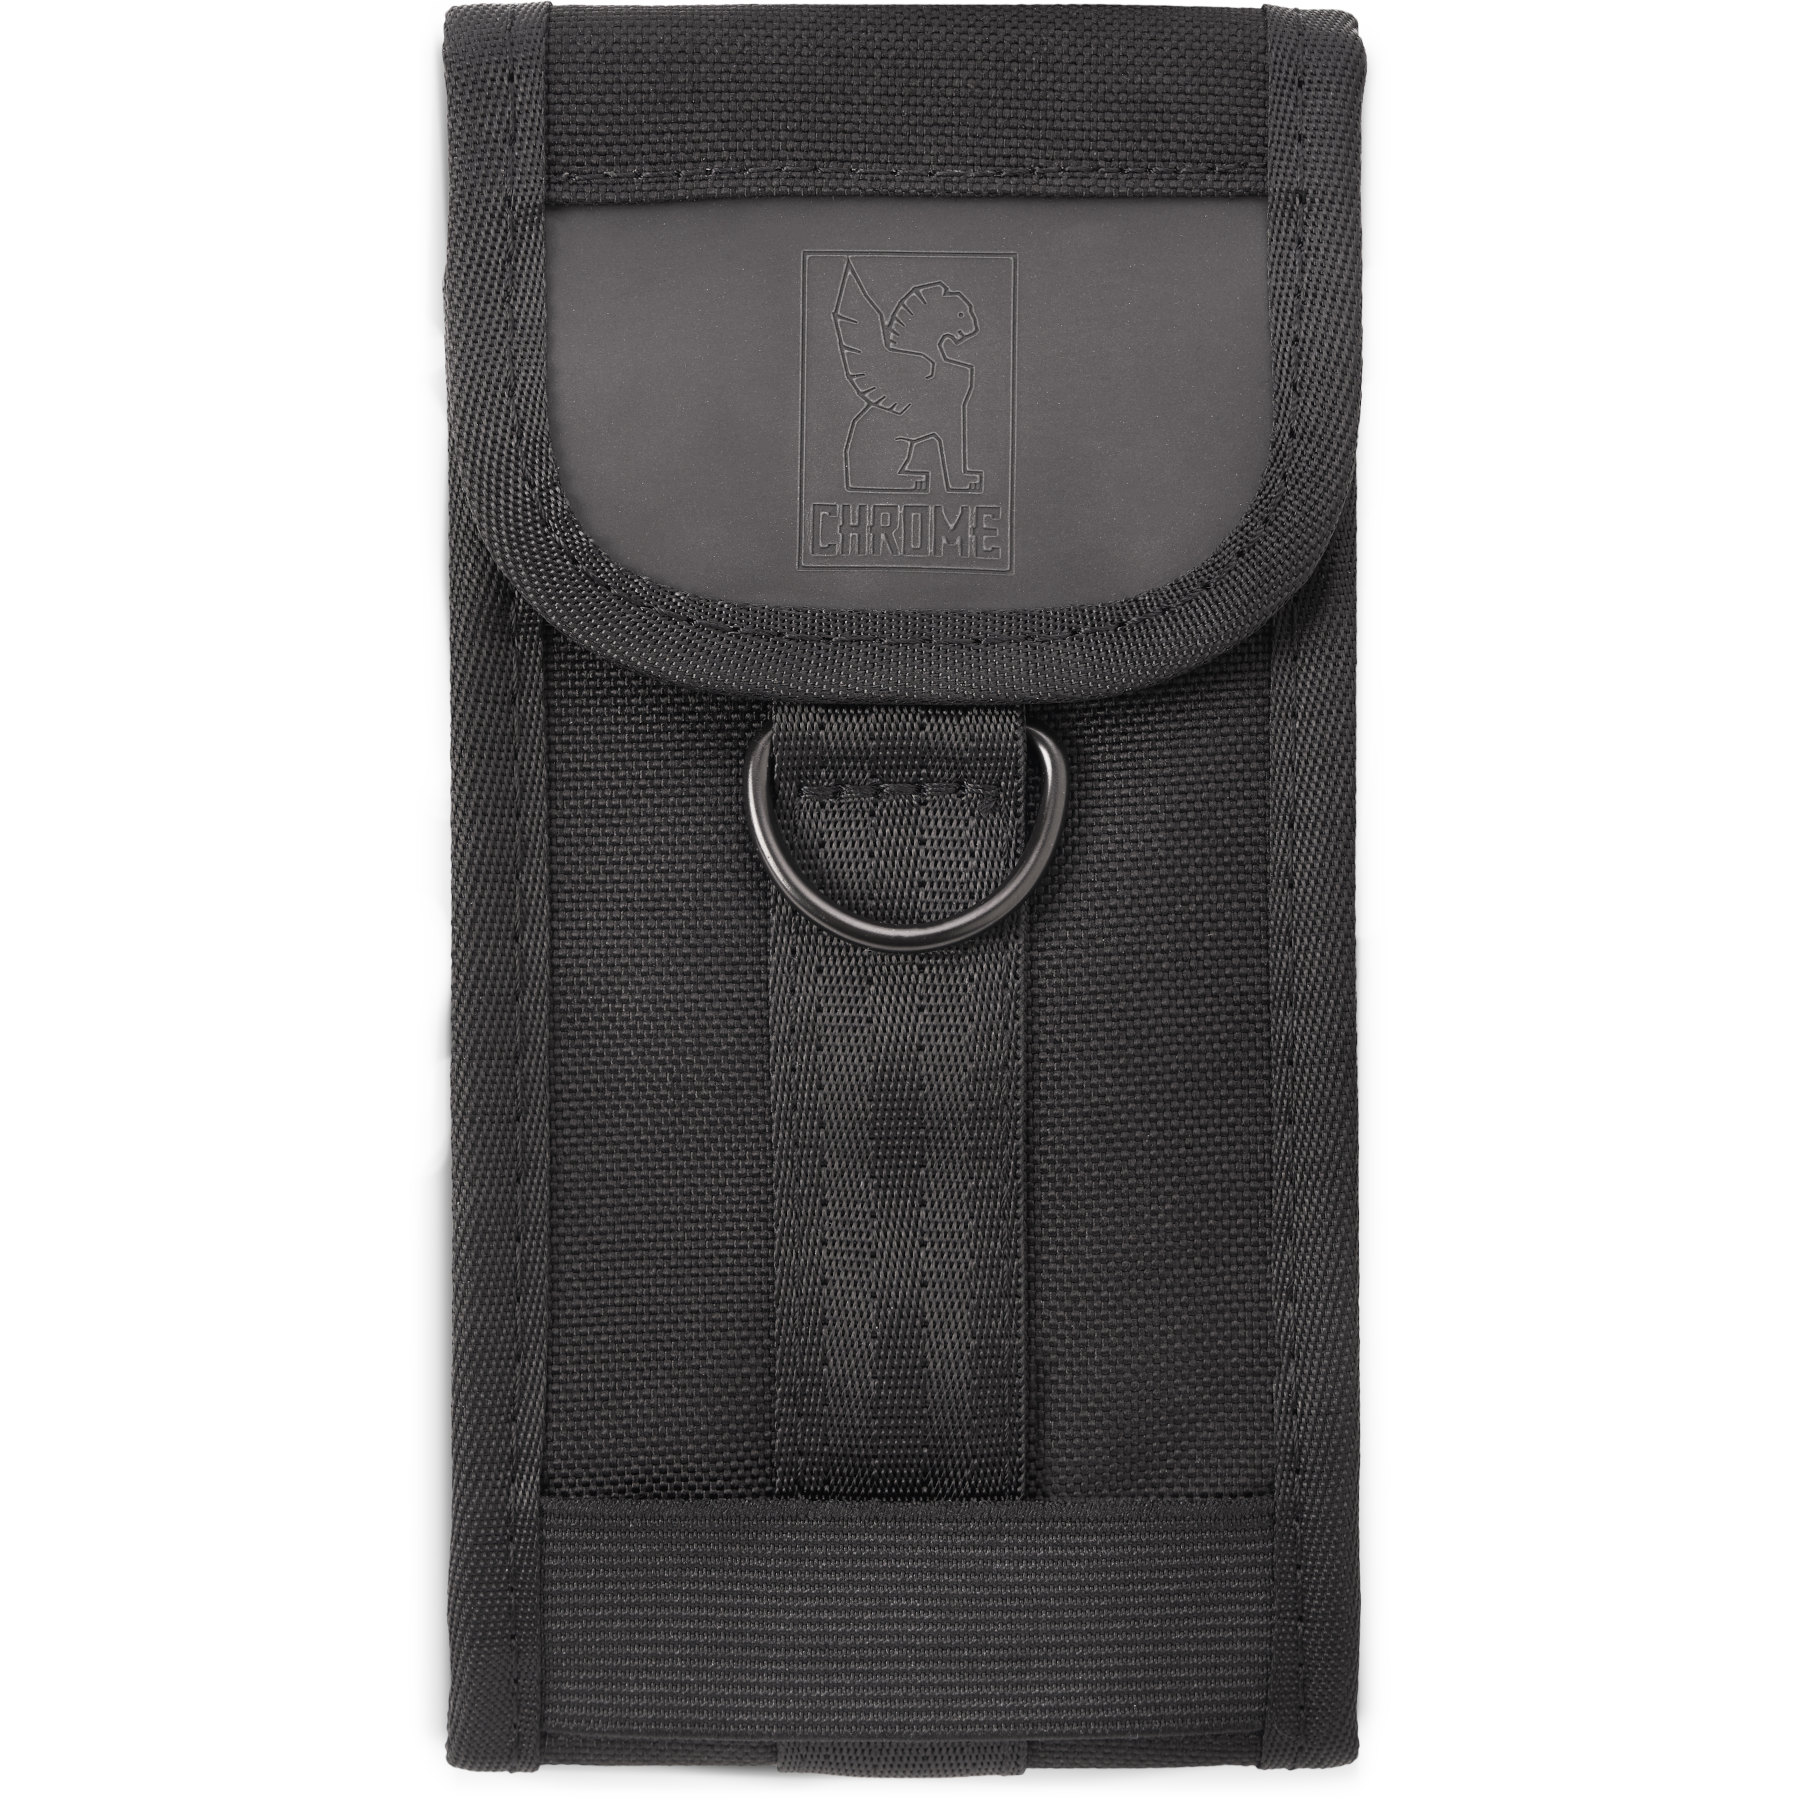 CHROME Phone Pouch Large - Black/Black